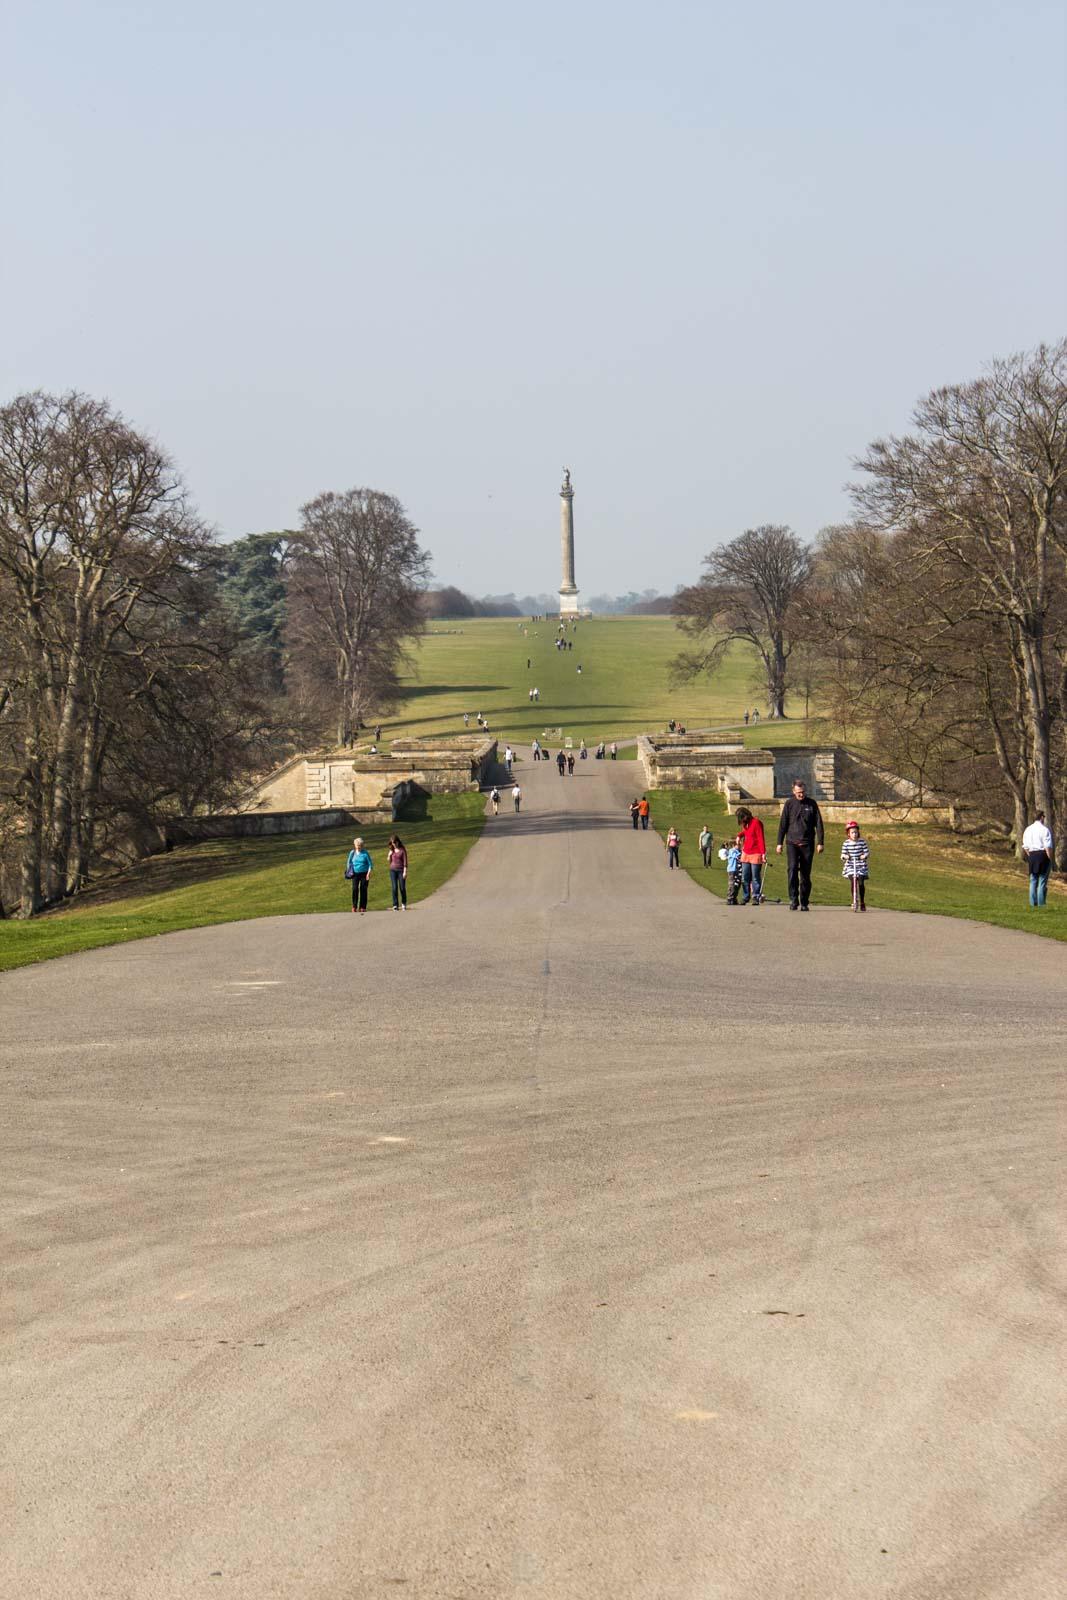 Visiting Blenheim Palace near Oxford, England